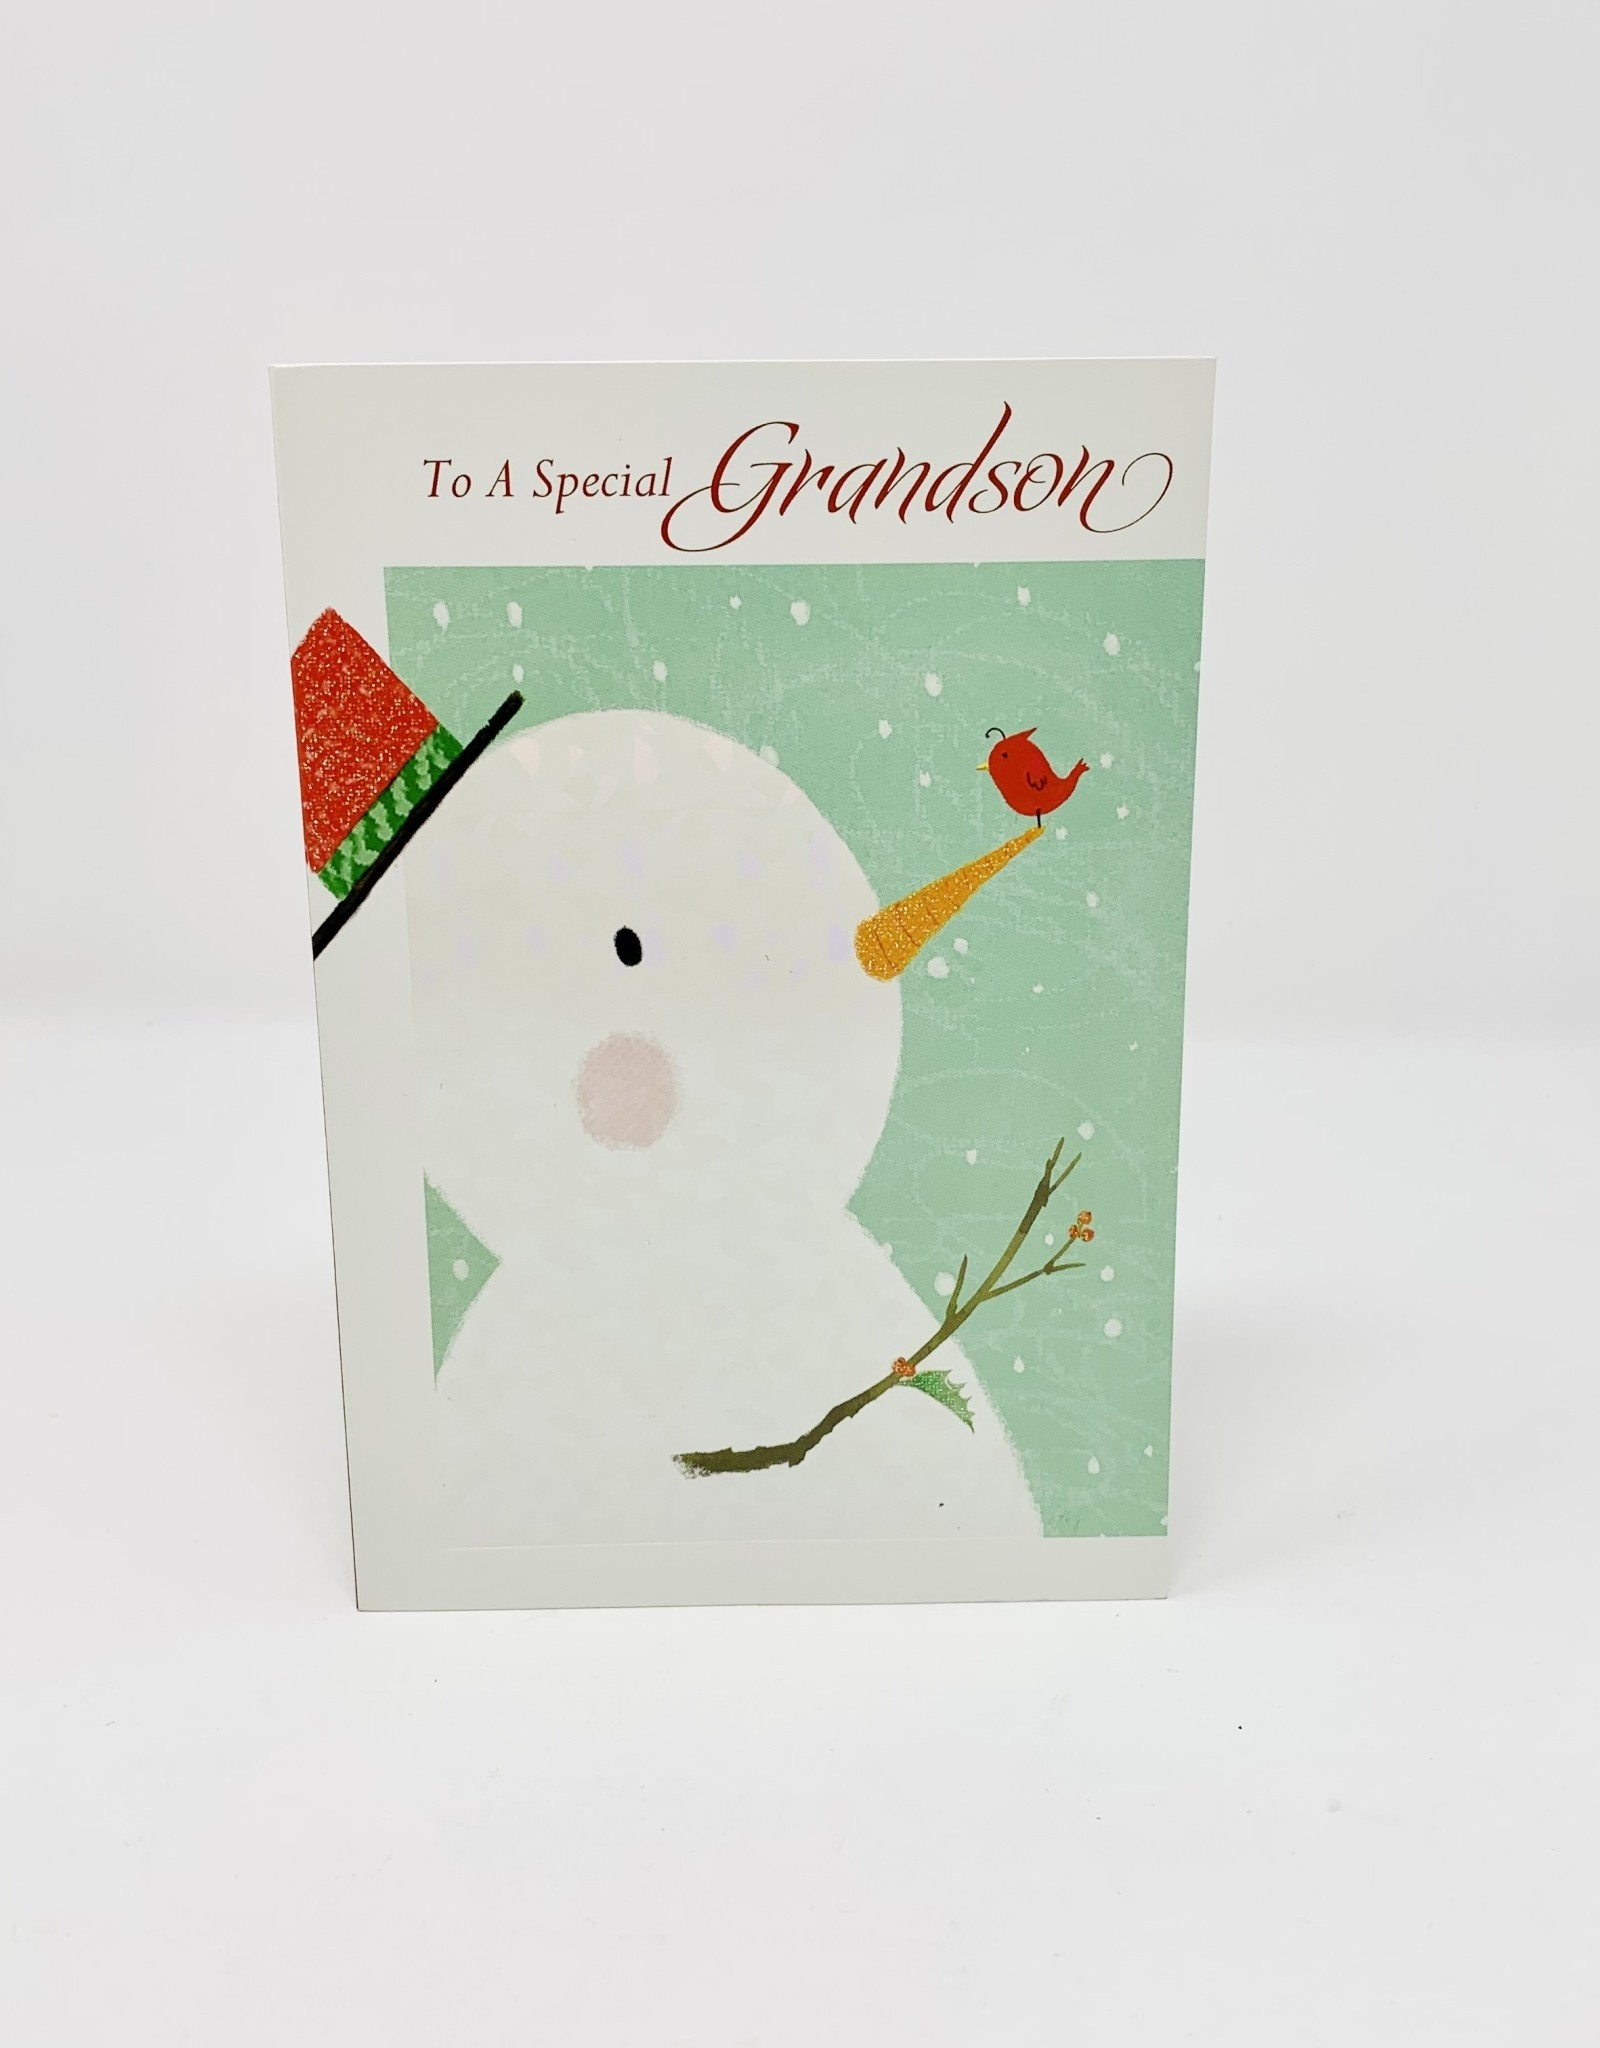 Pictura Grandson snowman and bird